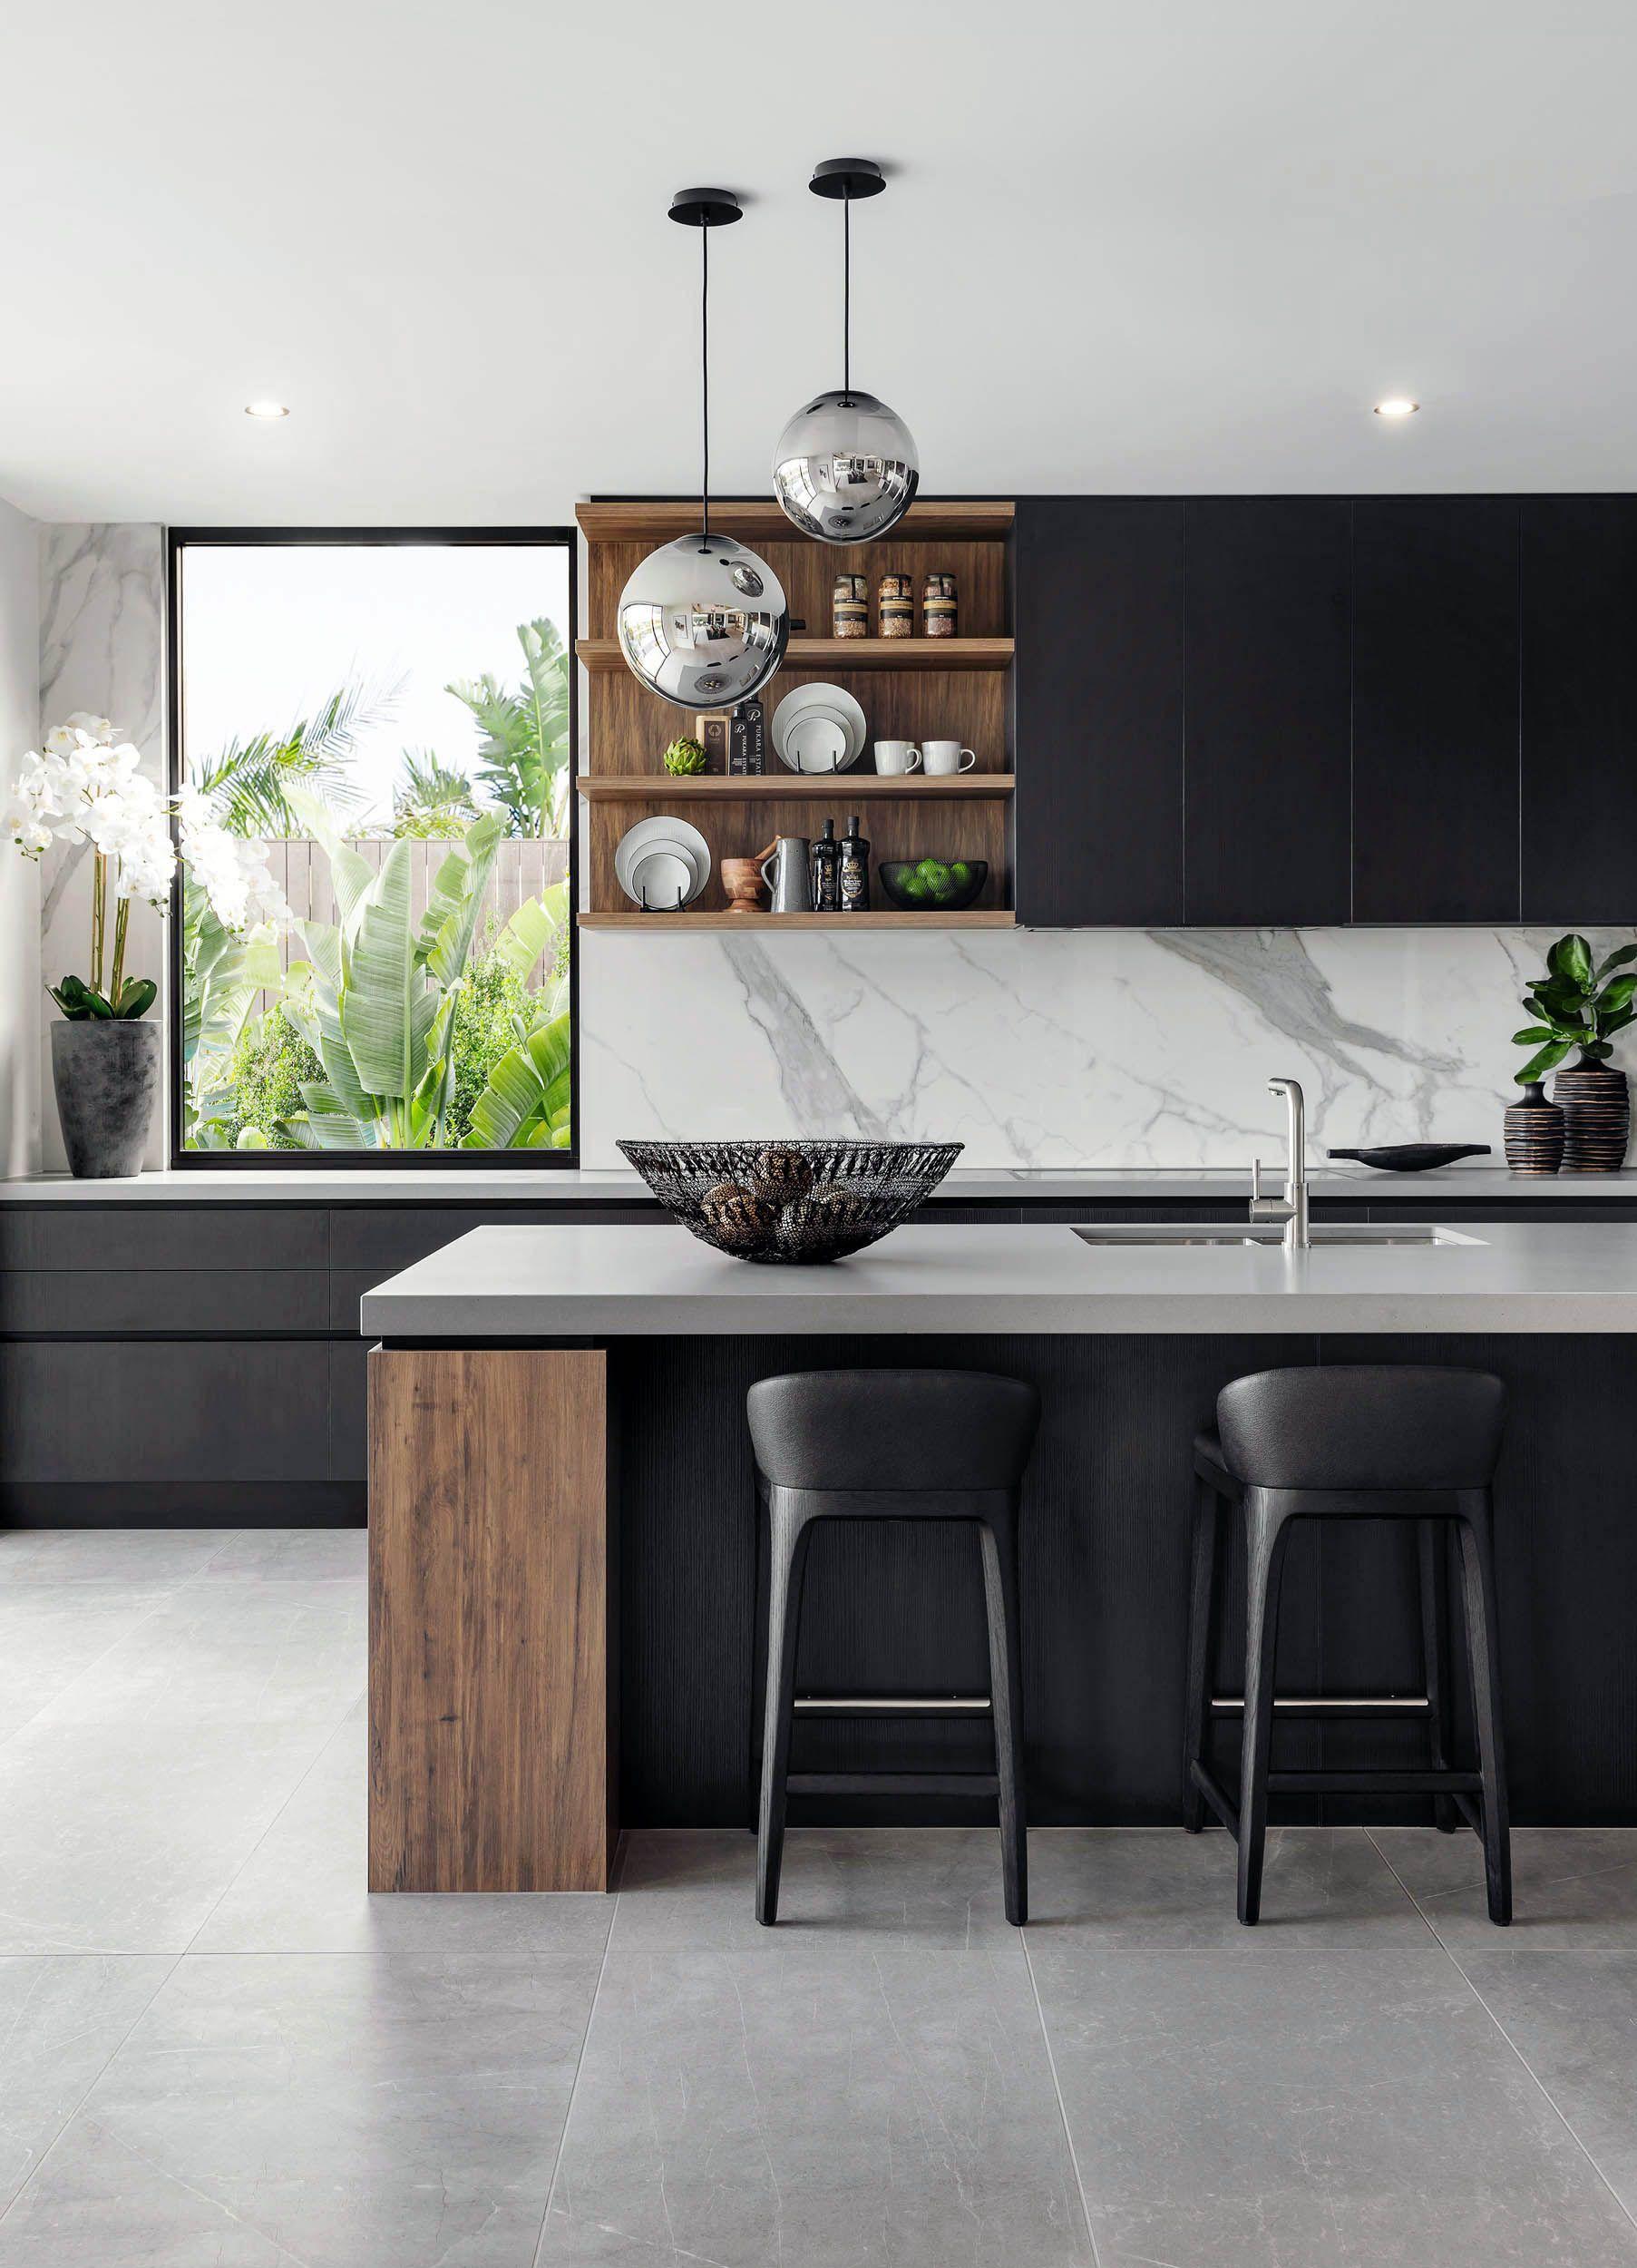 15 Stunning Ways To Upgrade White Kitchen Cabinets  Cuisine